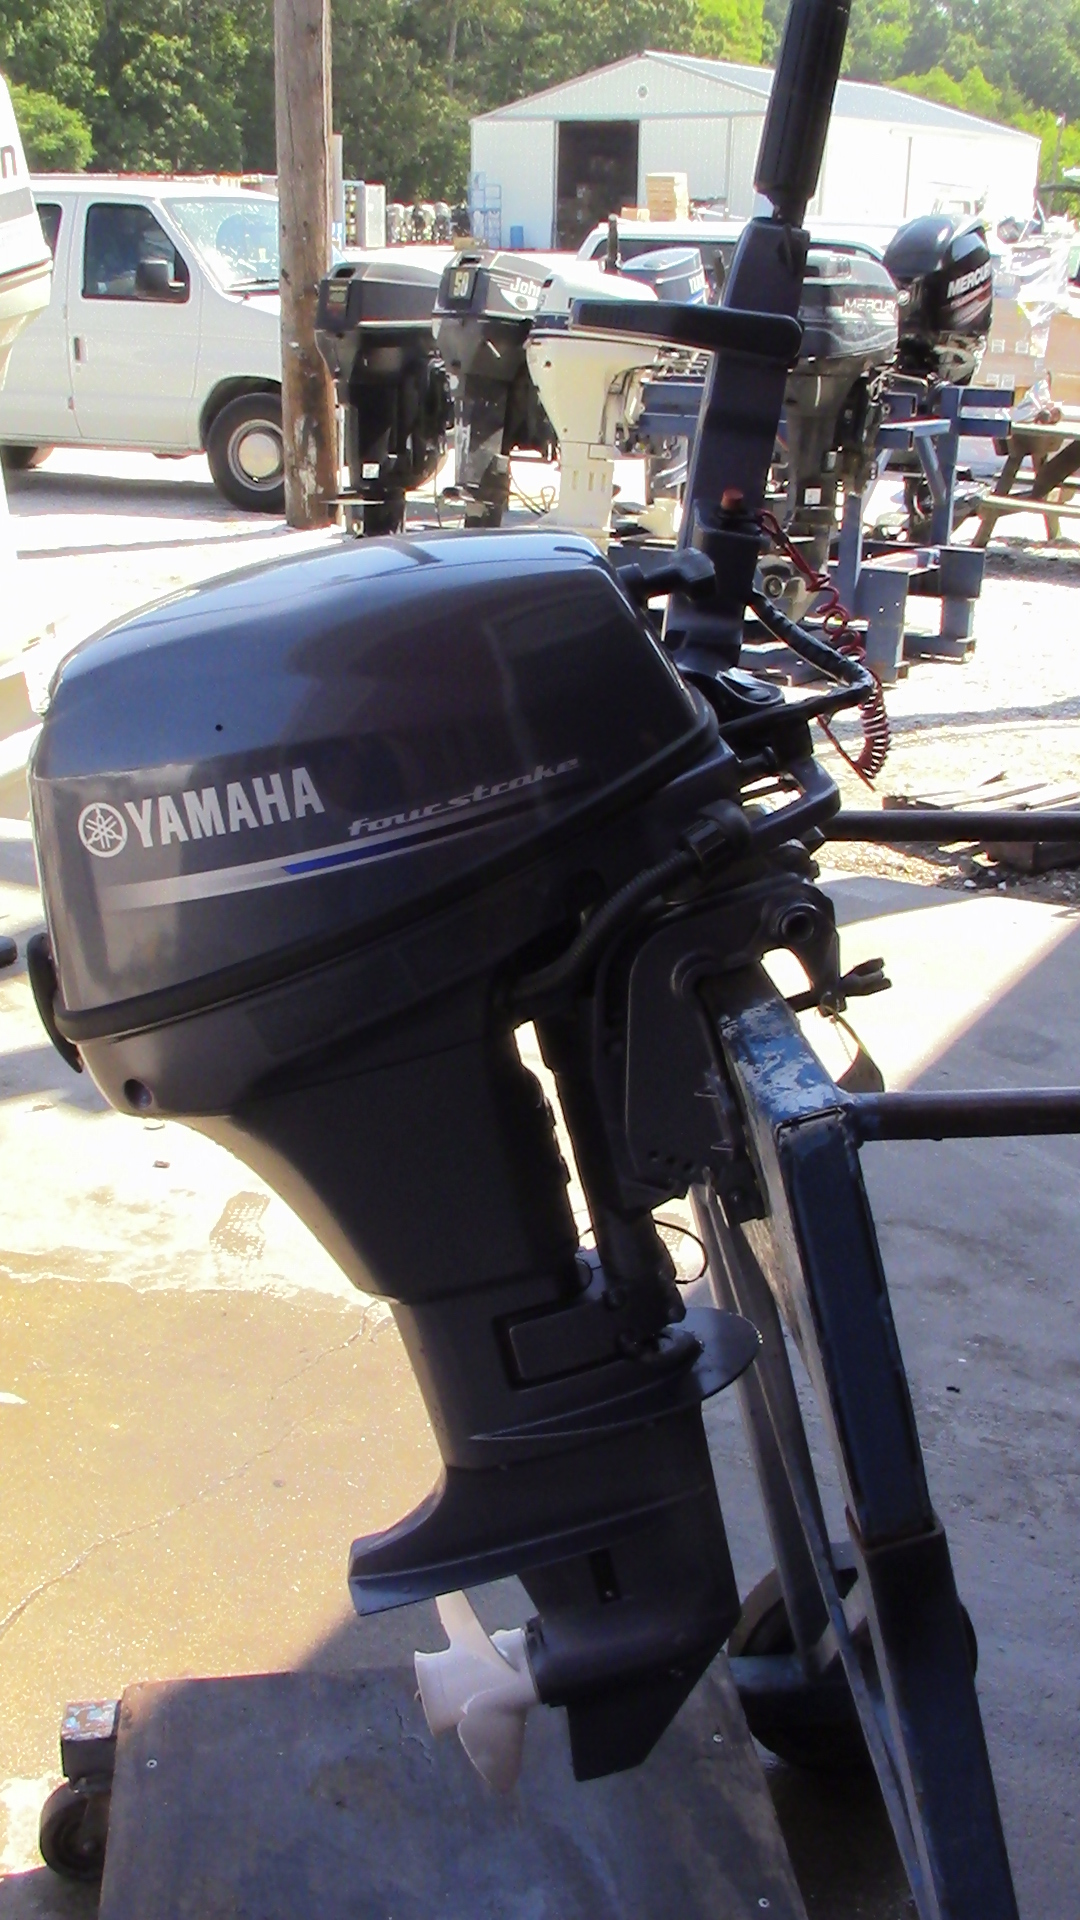 Used 2013 Yamaha F8smha 8hp 4 Stroke Tiller Outboard Boat